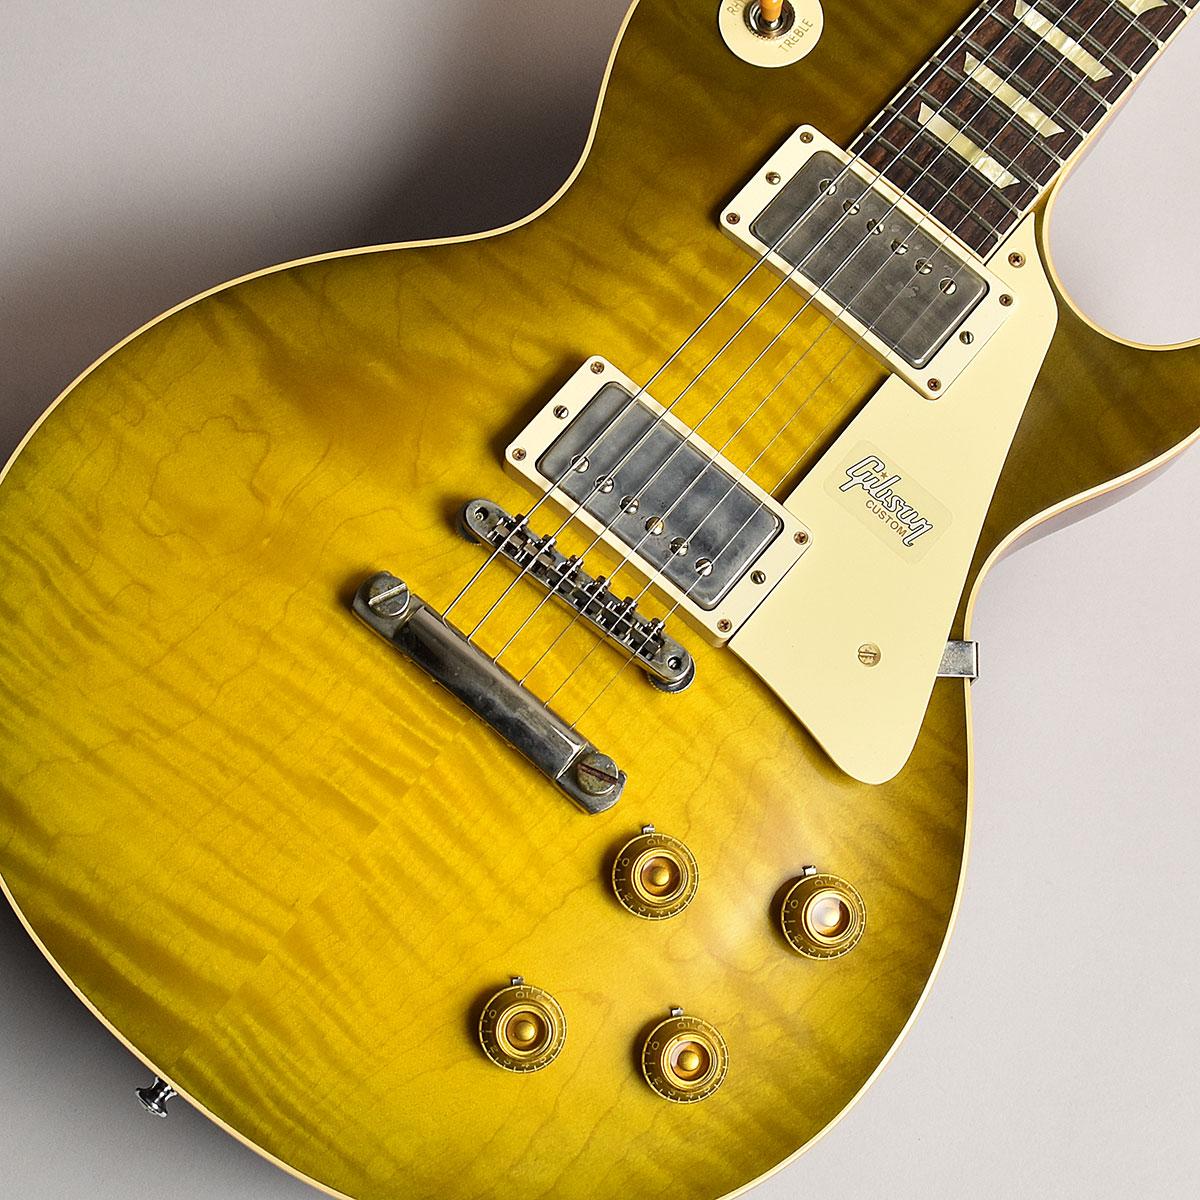 Gibson Custom Shop 60th 1959 Les Paul Standard Green Lemon Fade VOS S/N:991919 【ギブソン カスタムショップ】【60th Anniversary】【未展示品】